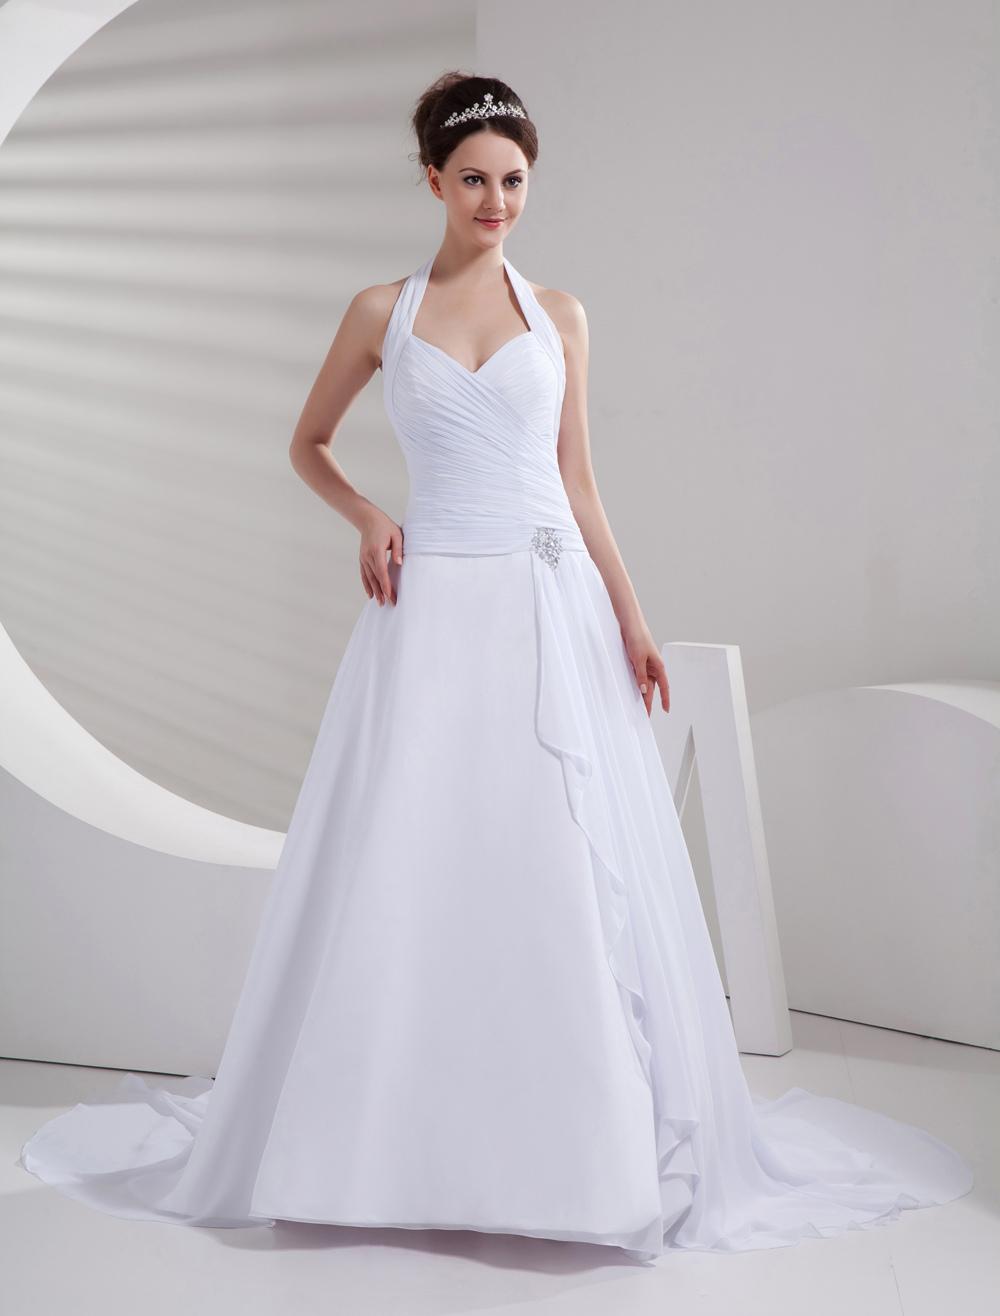 Amazing White Halter A-line Chiffon Sweep Wedding Dress